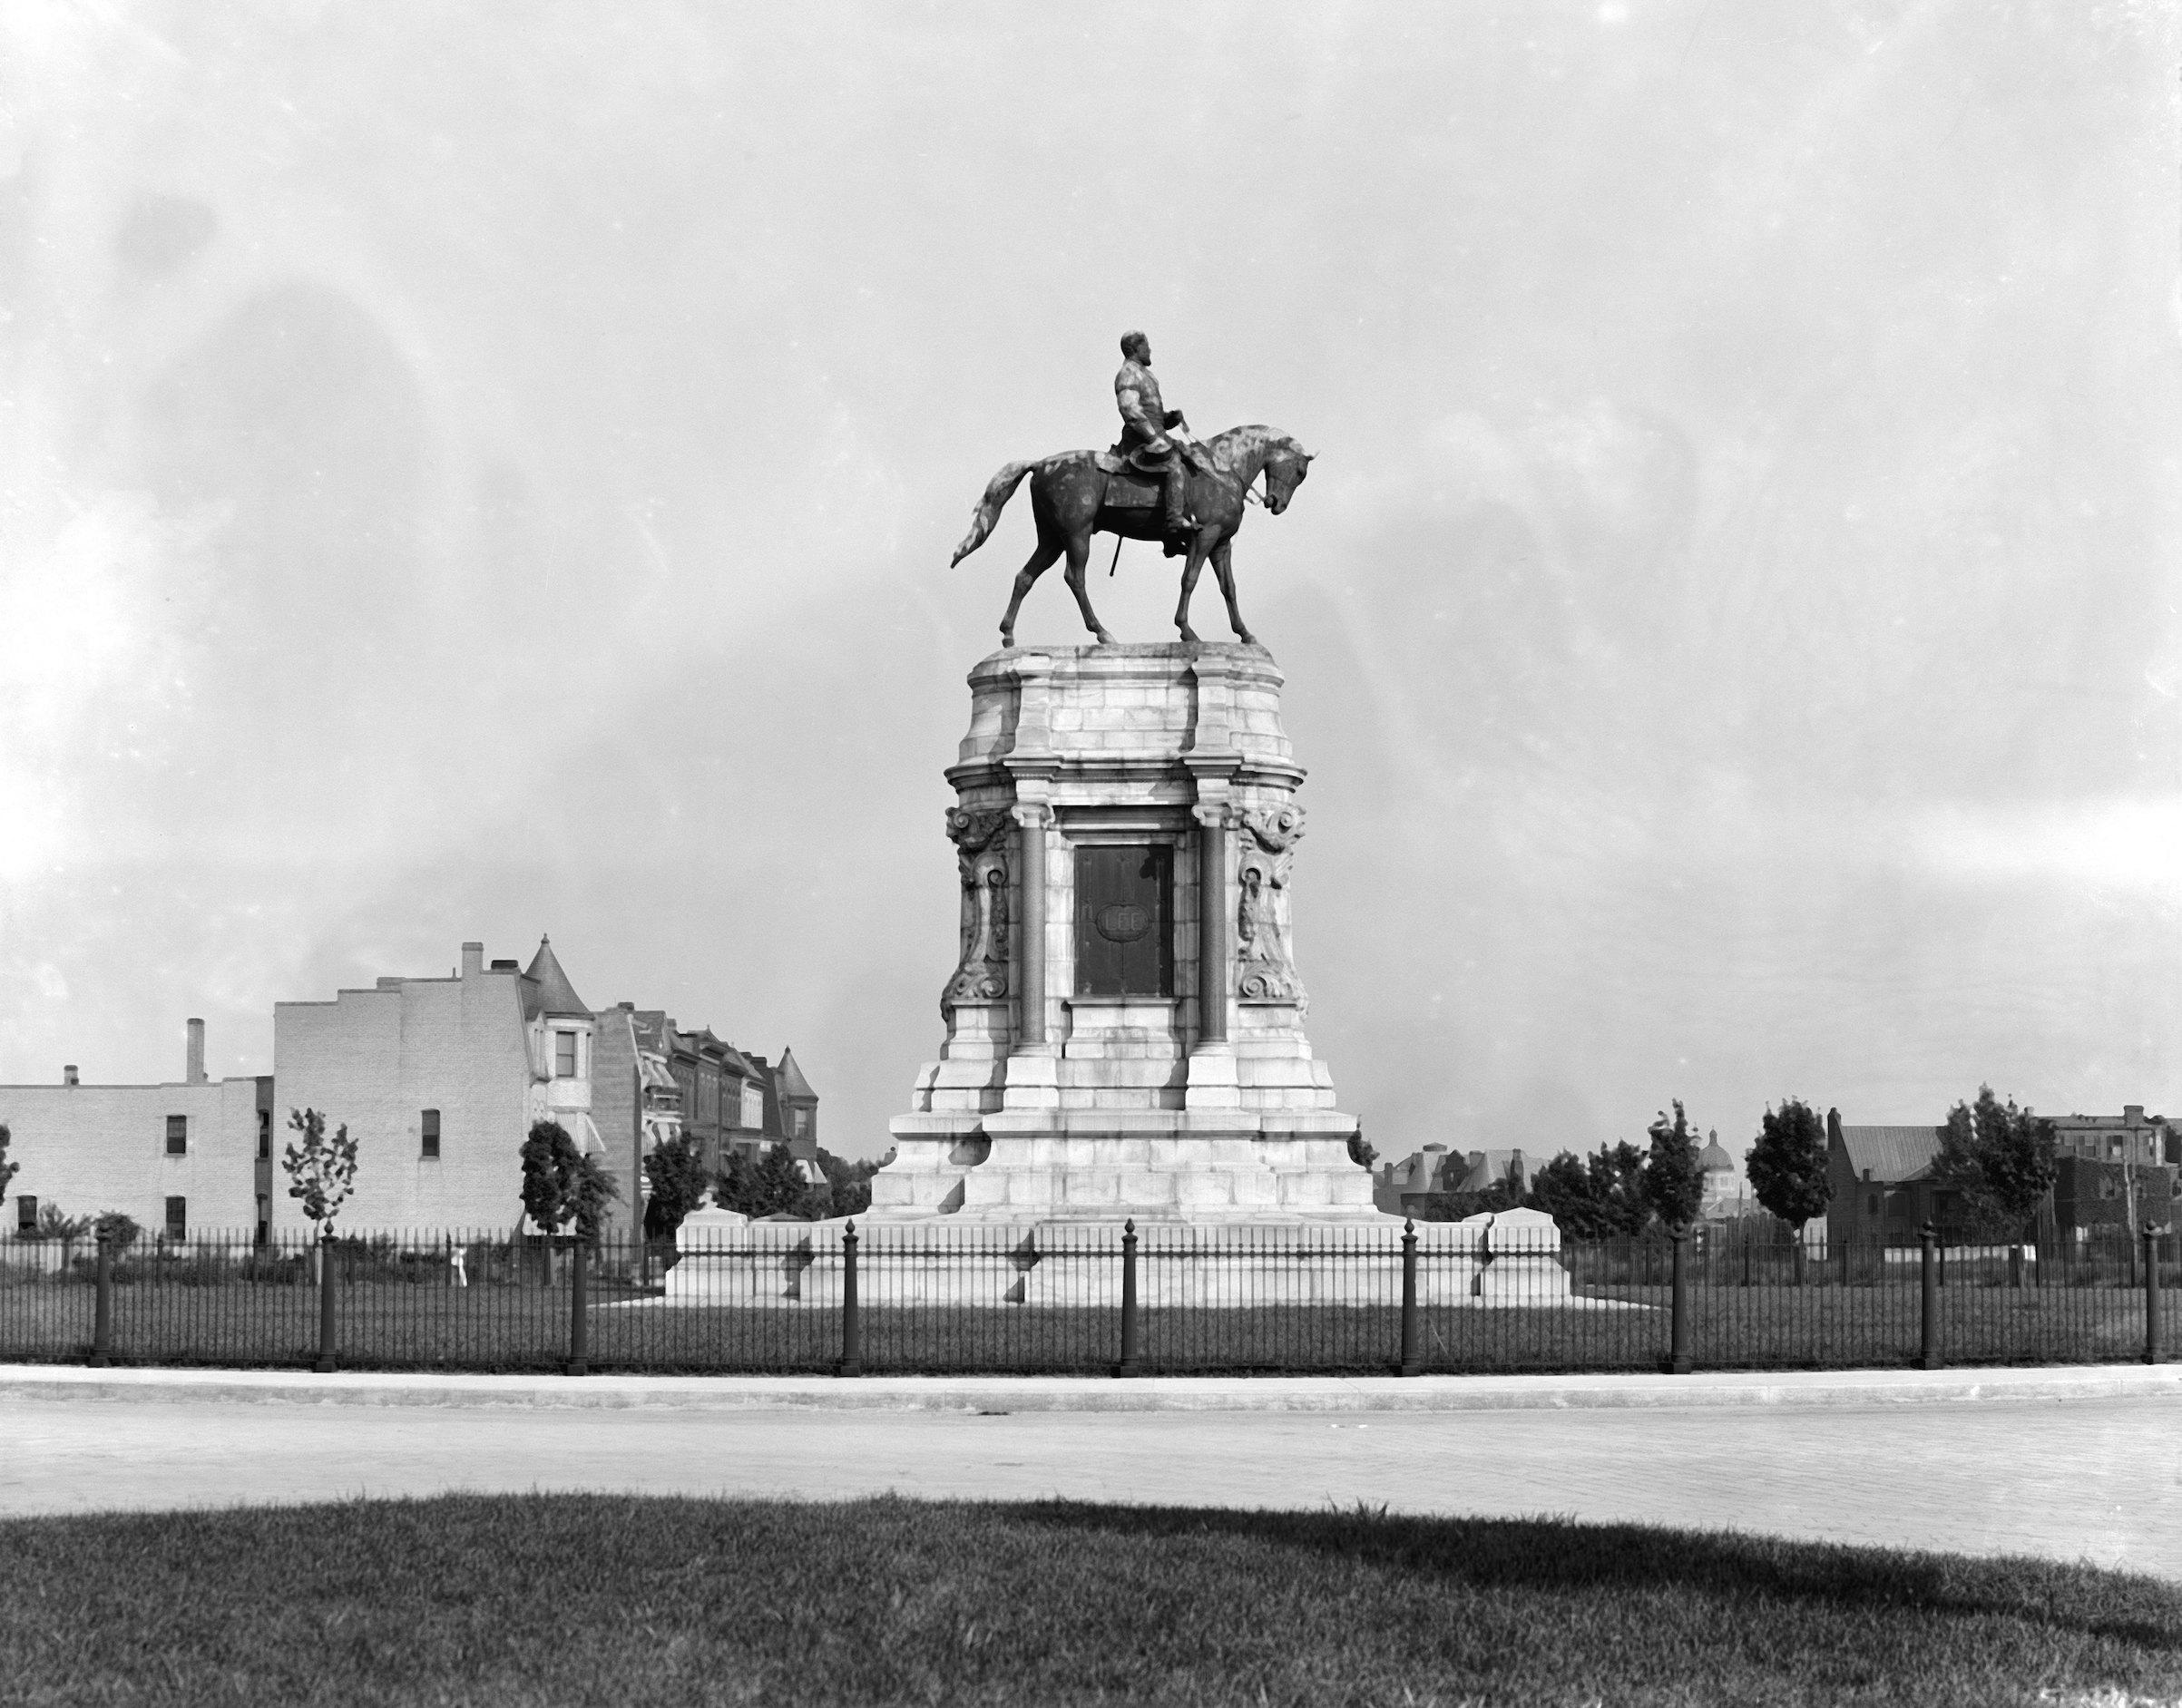 Equestrian statue of Robert E. Lee in Richmond in 1905.